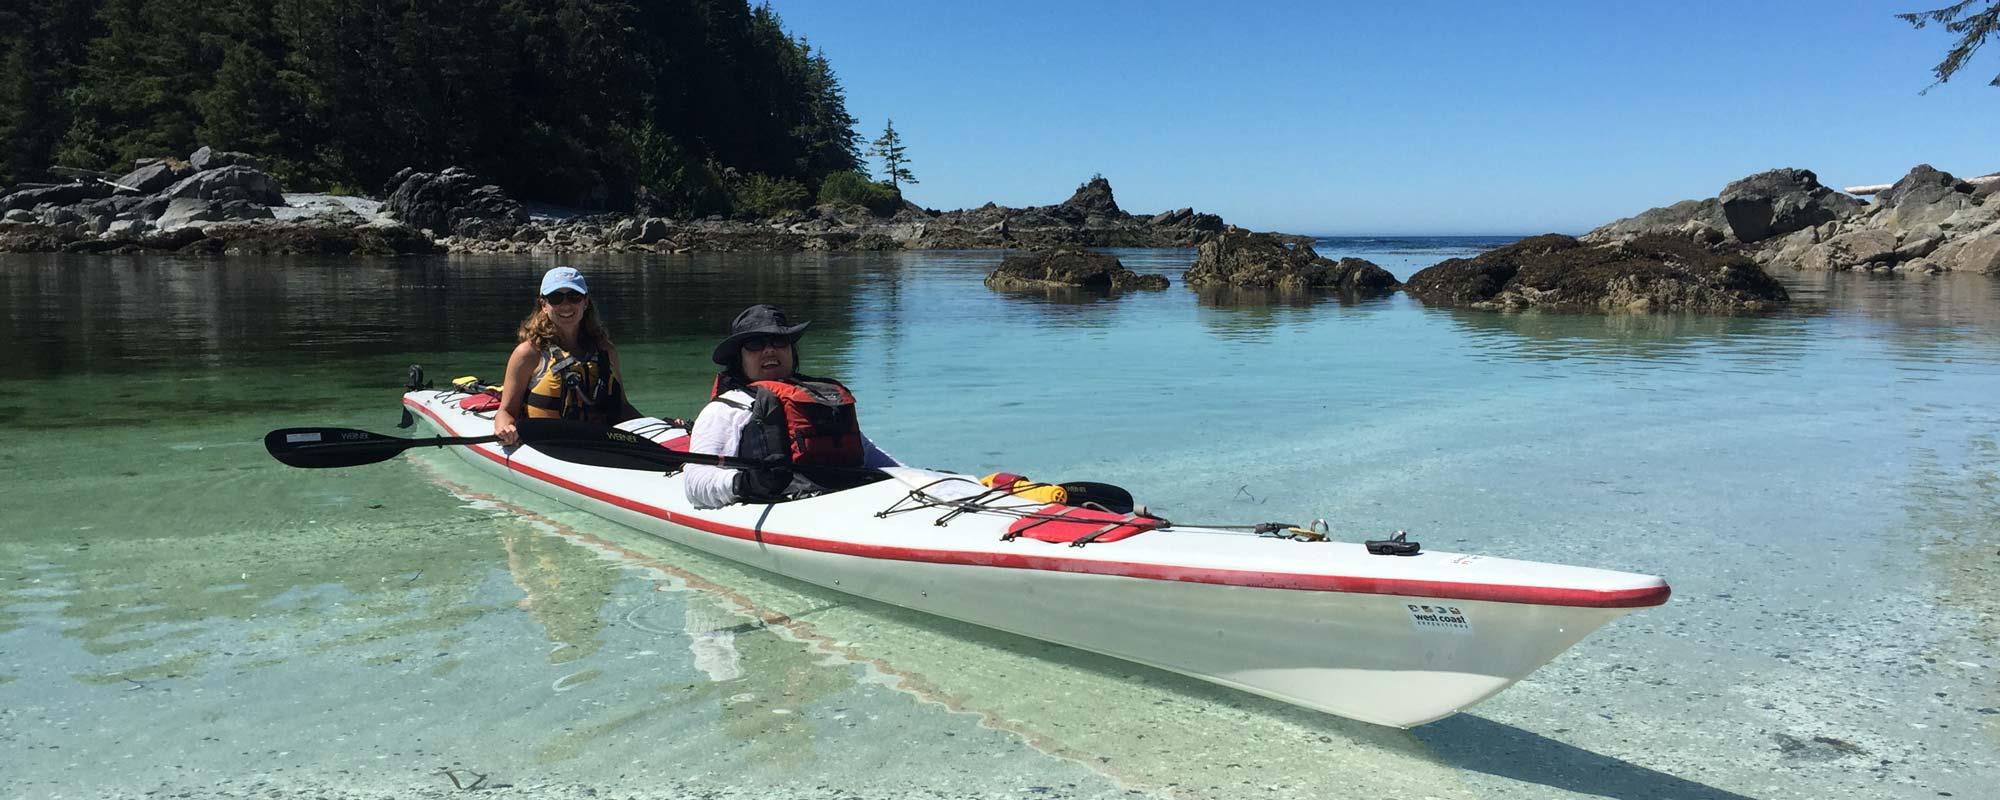 vancouver island sea kayaking tours & canadian wilderness retreat